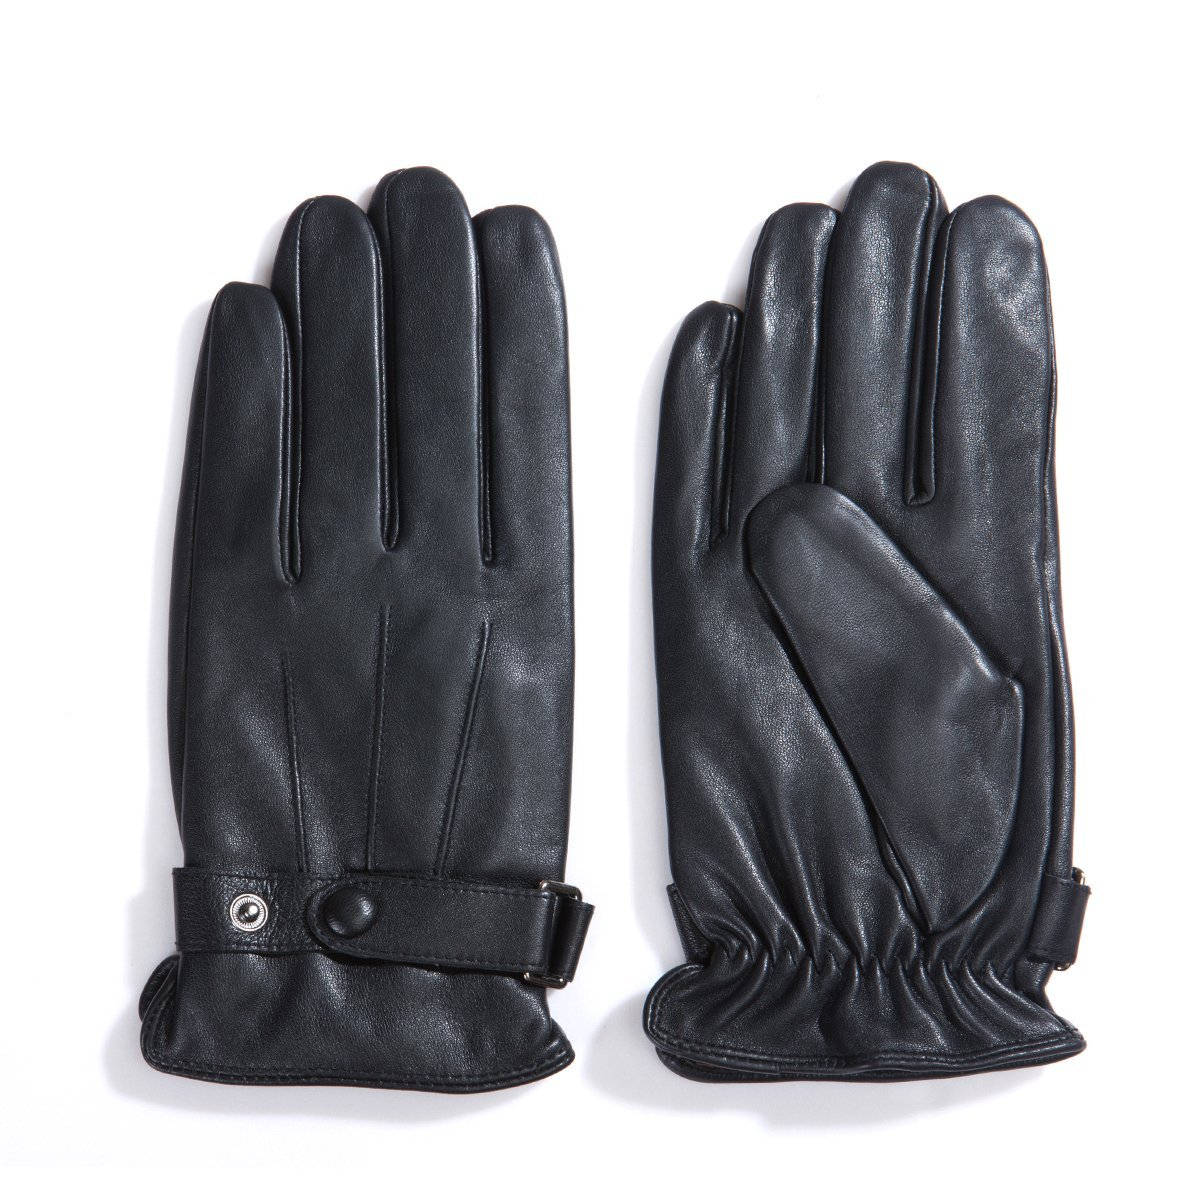 MATSU Men Winter Warm Lambskin Leather 100% Cashmere lined Touch Screen Gloves M2011